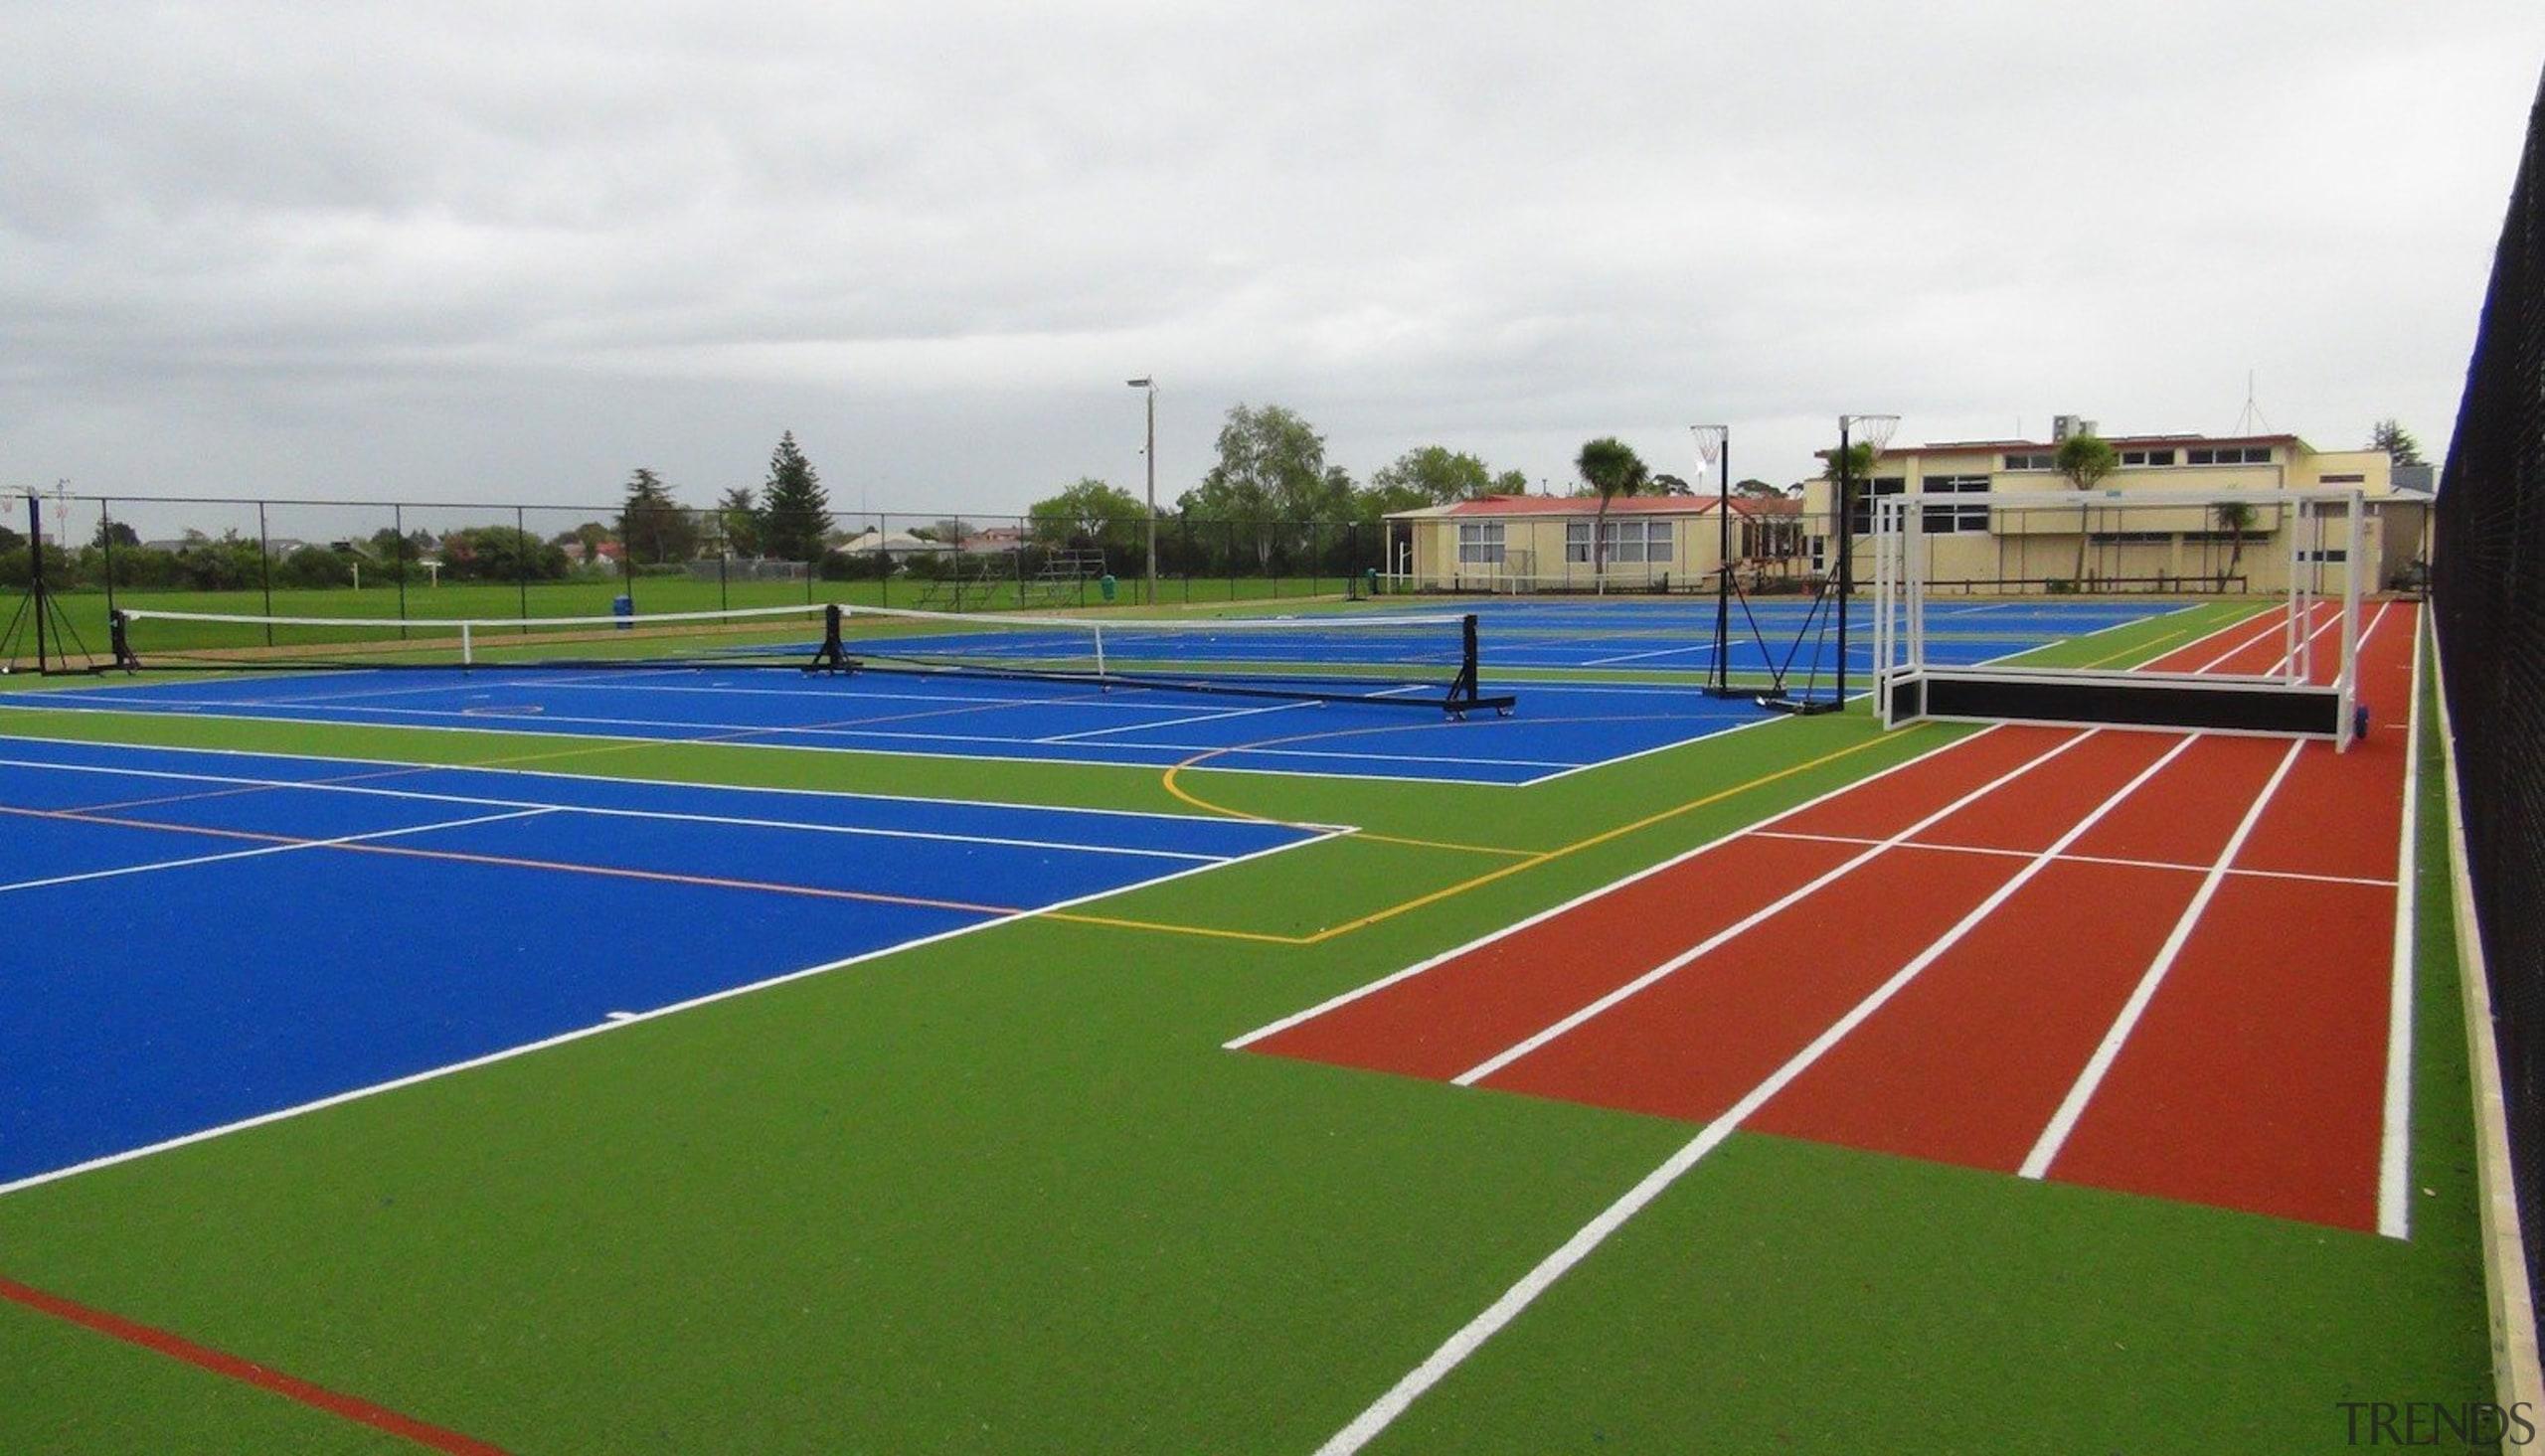 Pre-school, primary & seconday education - Pre-school, primary ball game, grass, line, sport venue, sports, structure, tennis court, white, green